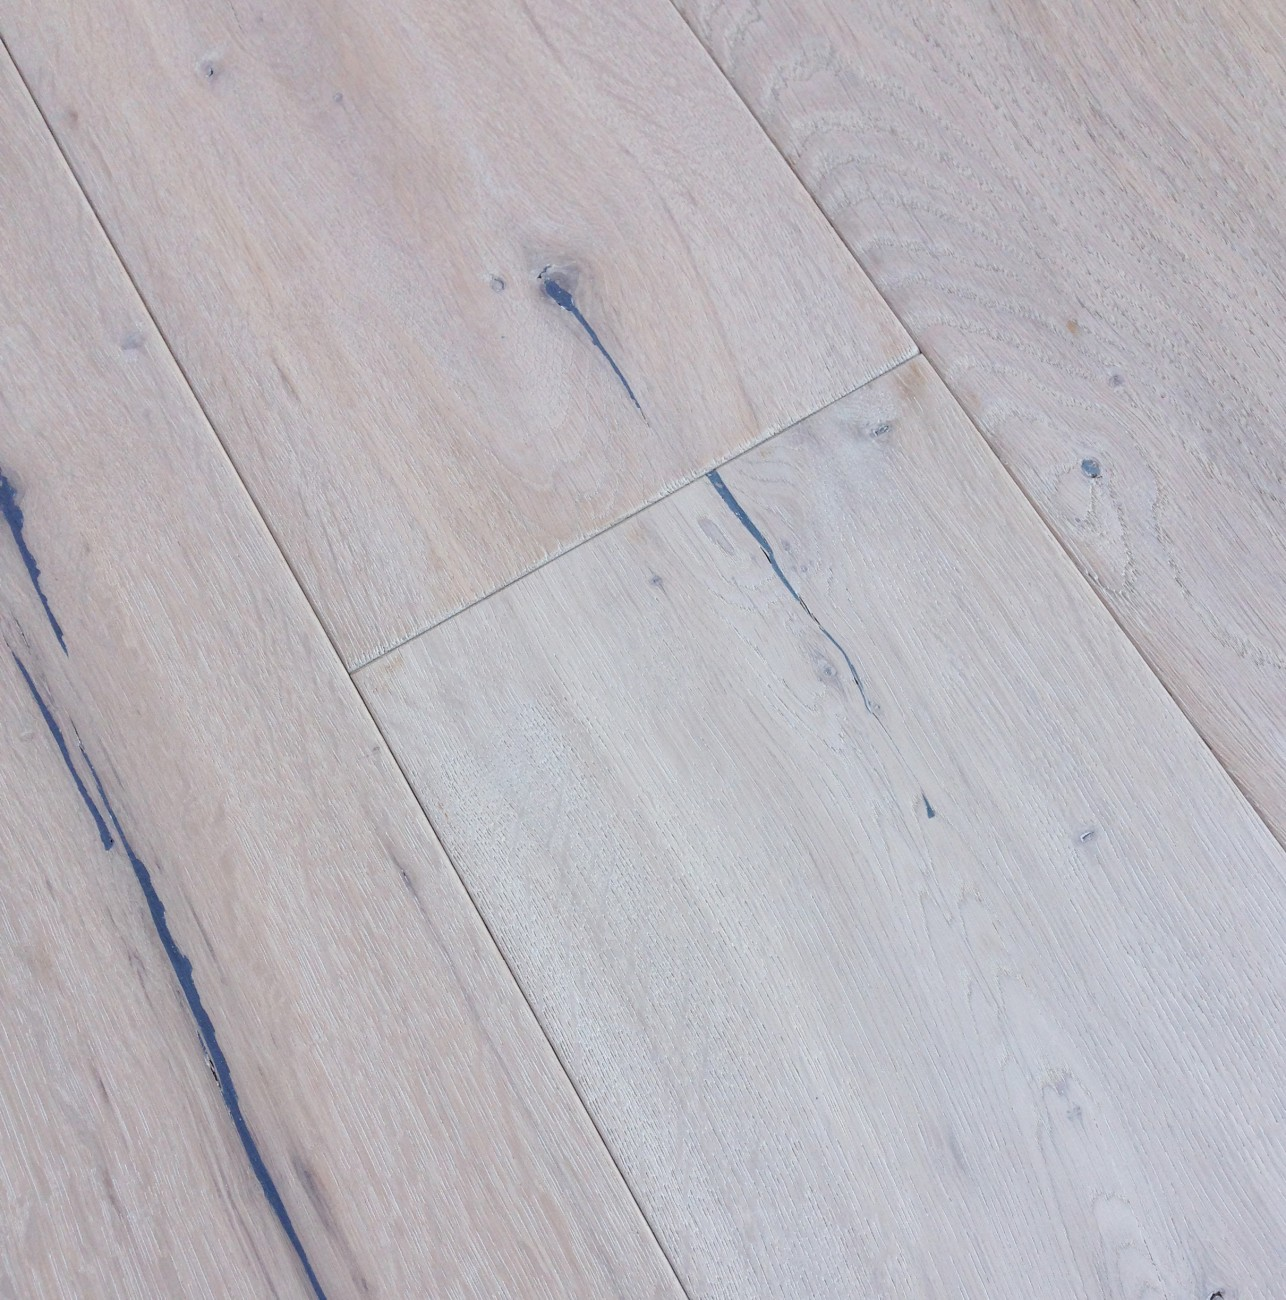 Whitewashed White Oak Raised Grain Eco Friendly Flooring